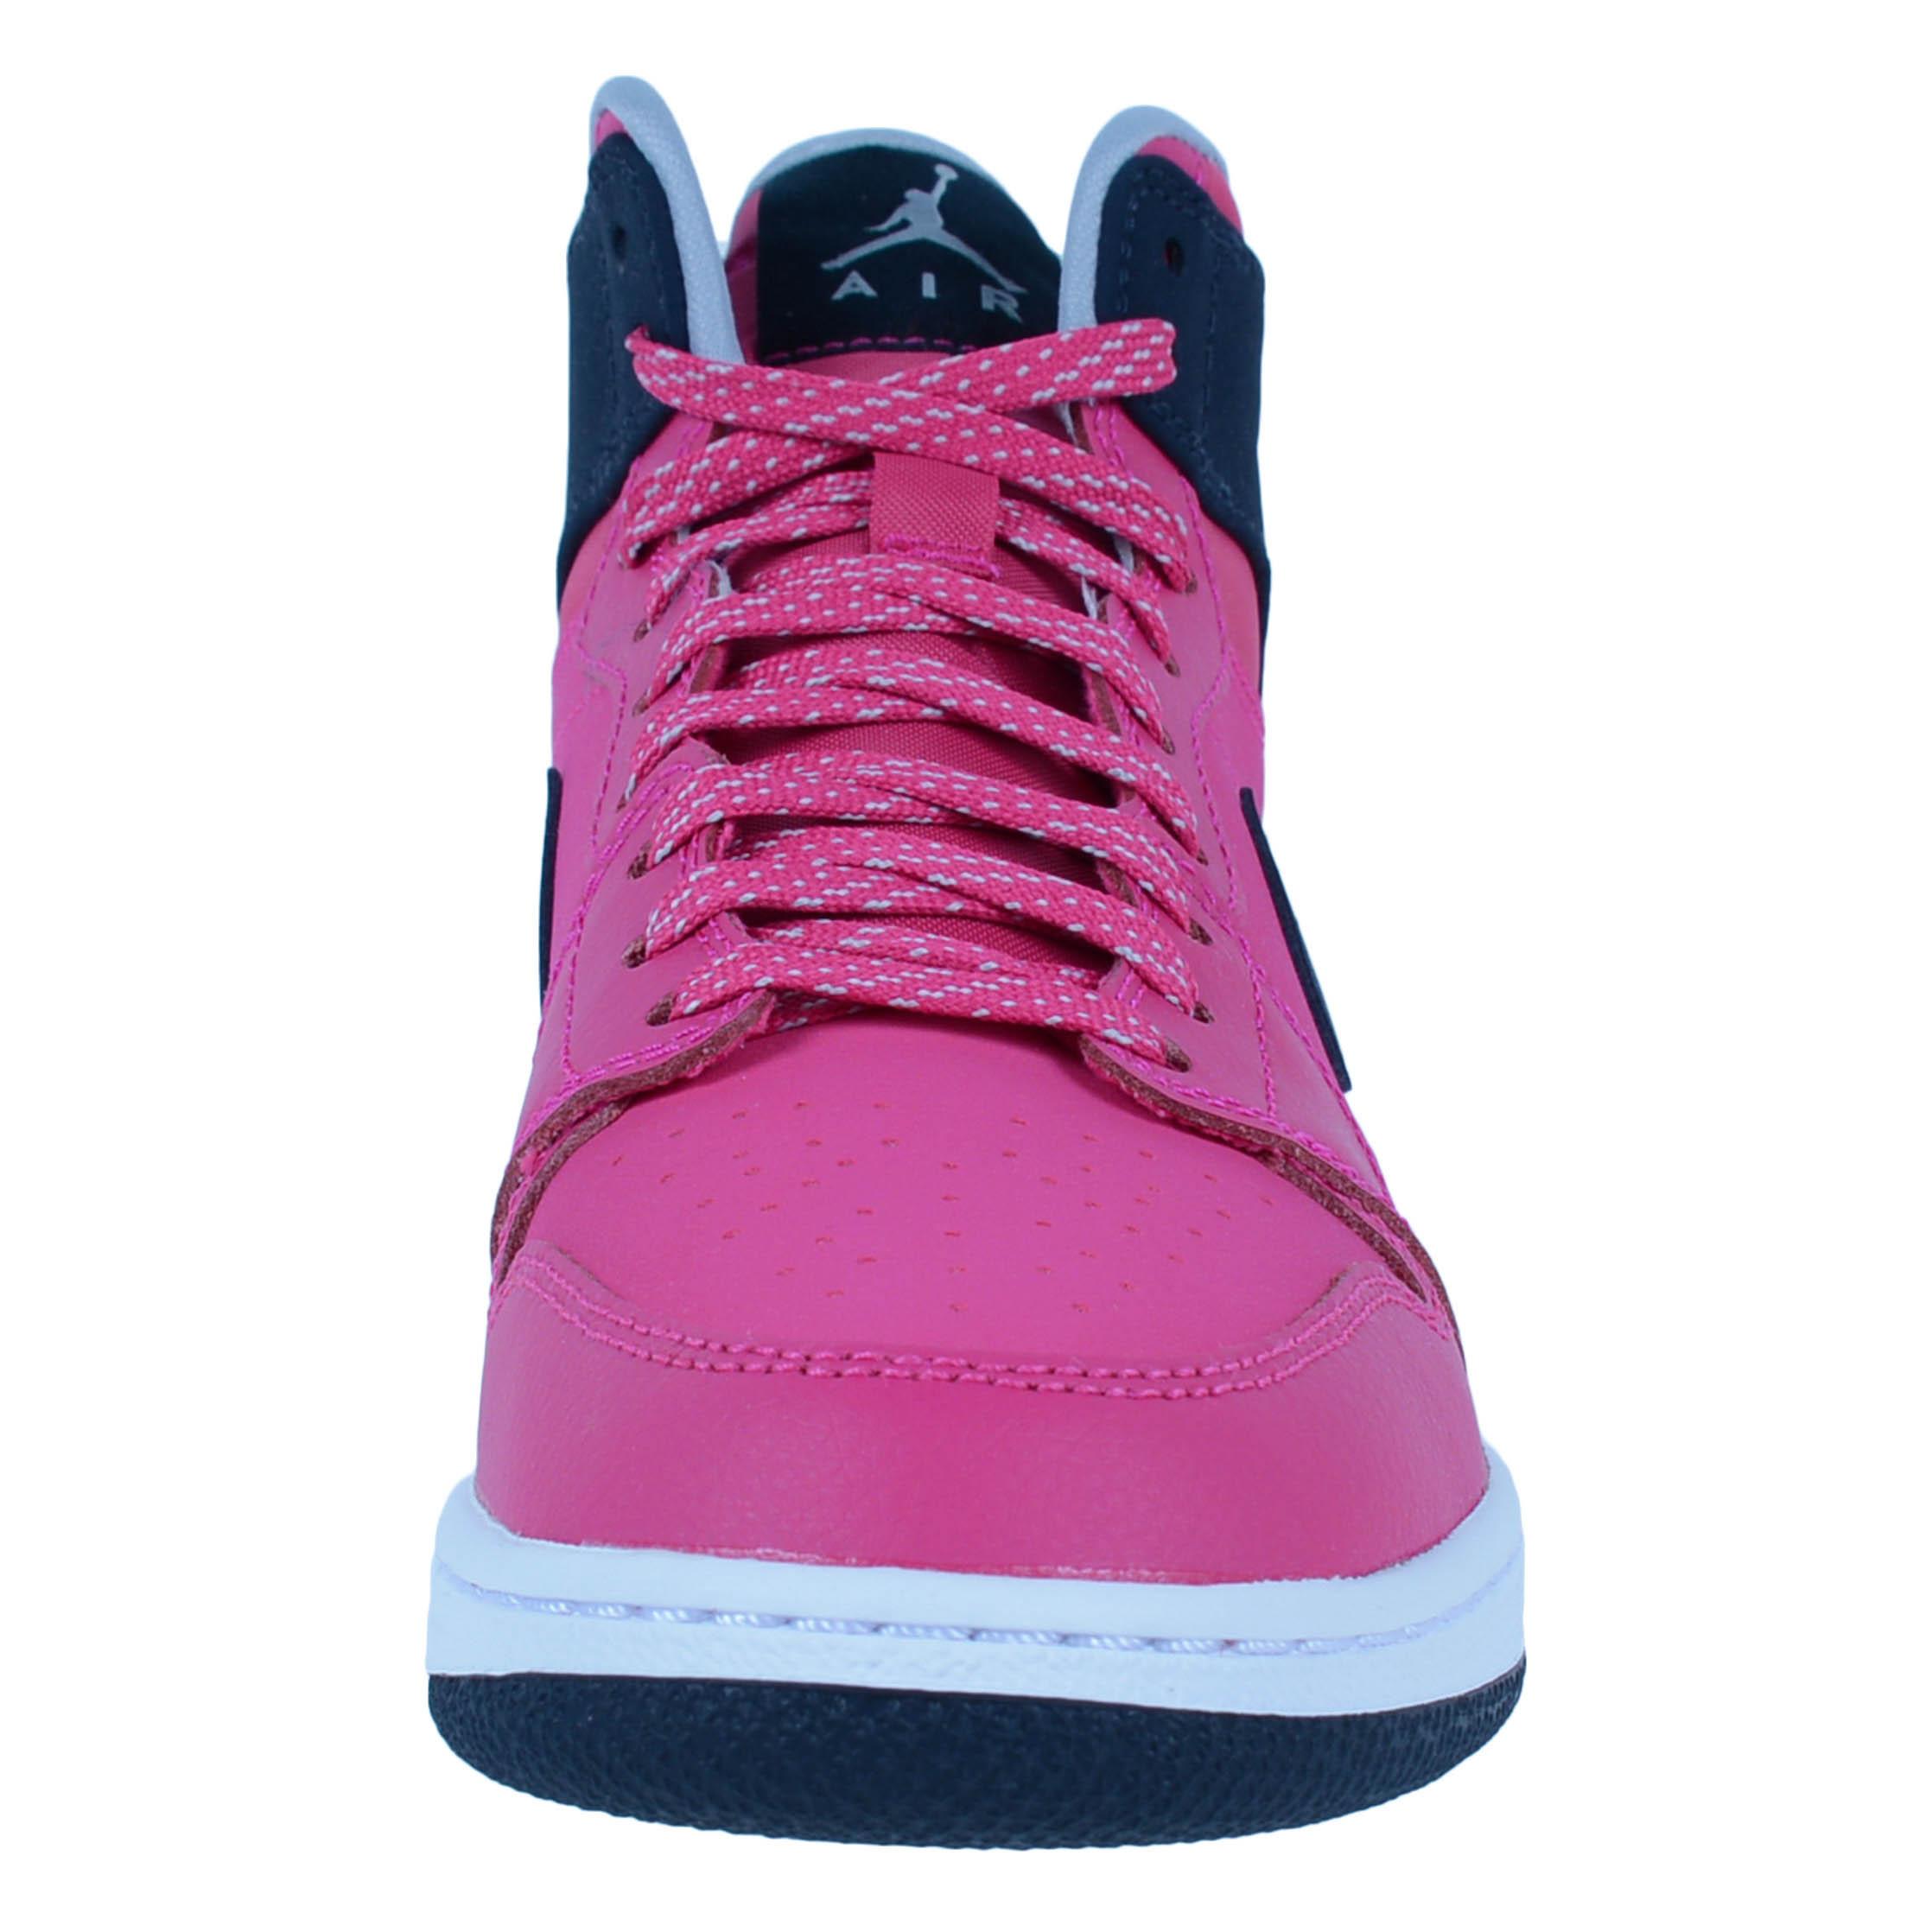 1b6c9b56e26e ... coupon code for white neutral grey vivid pink black nike girls air  jordan 1 retro high